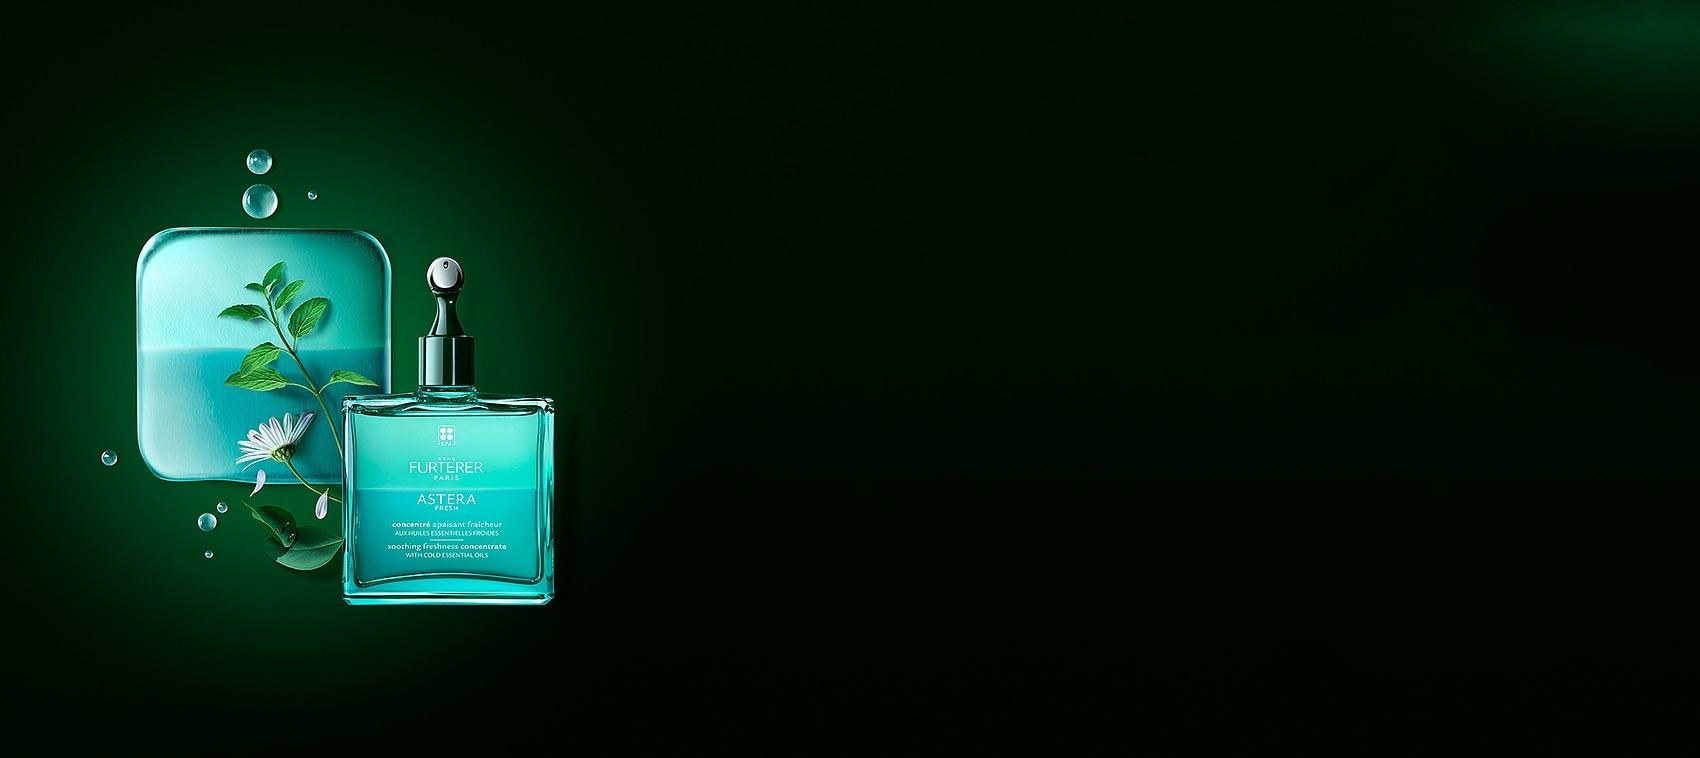 ASTERA FRESH - Rituel apaisant fraîcheur - Cuir chevelu irrité | René Furterer